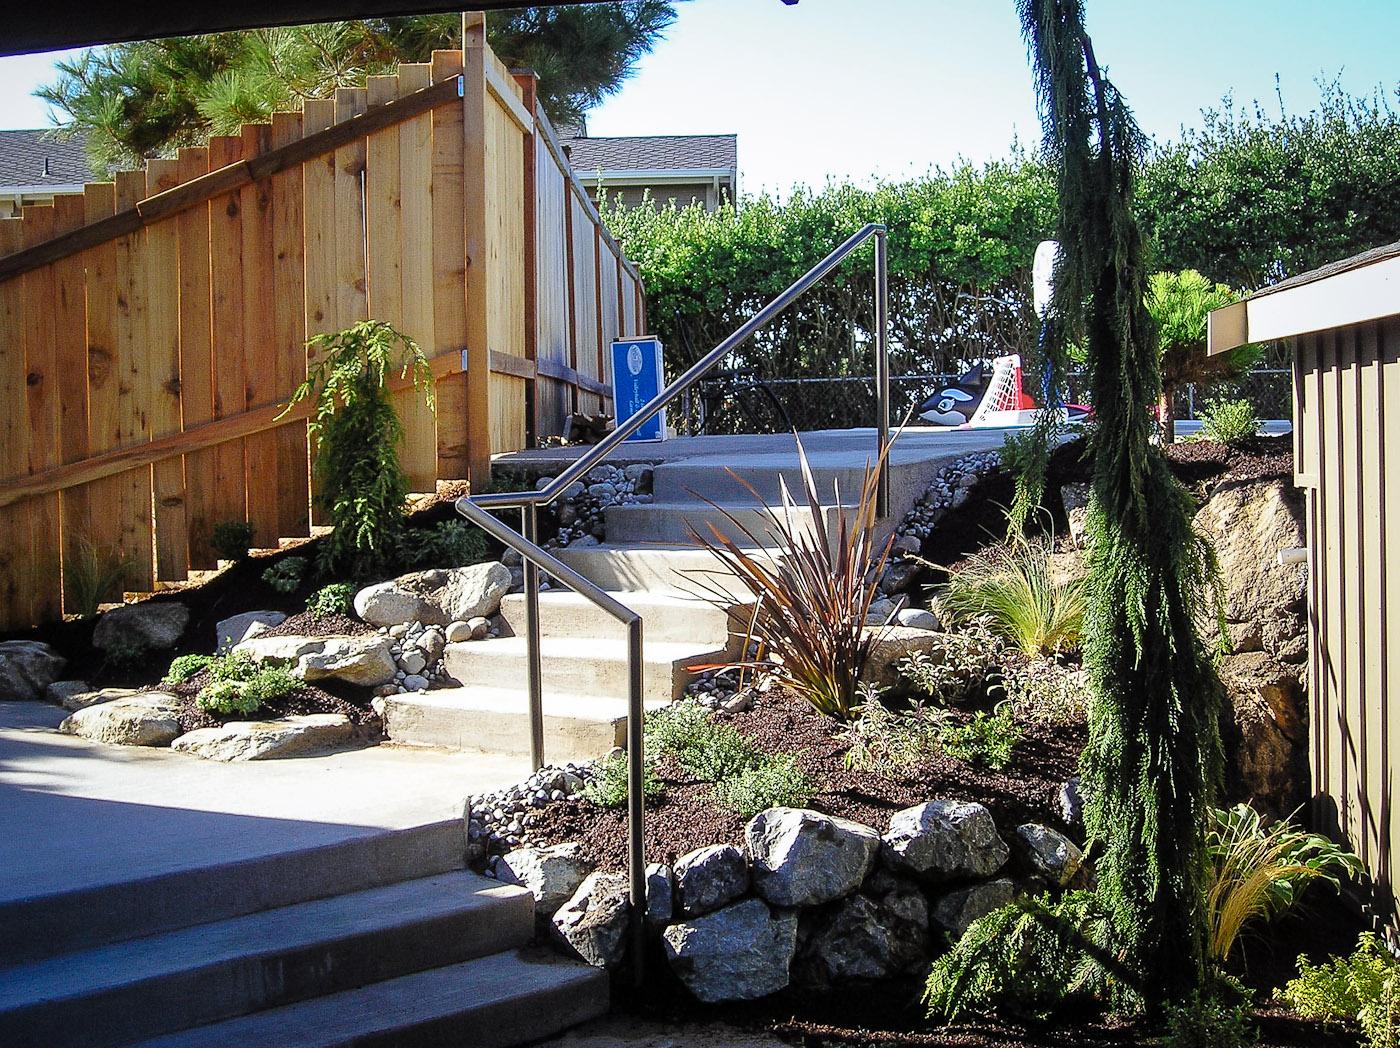 - Handrails